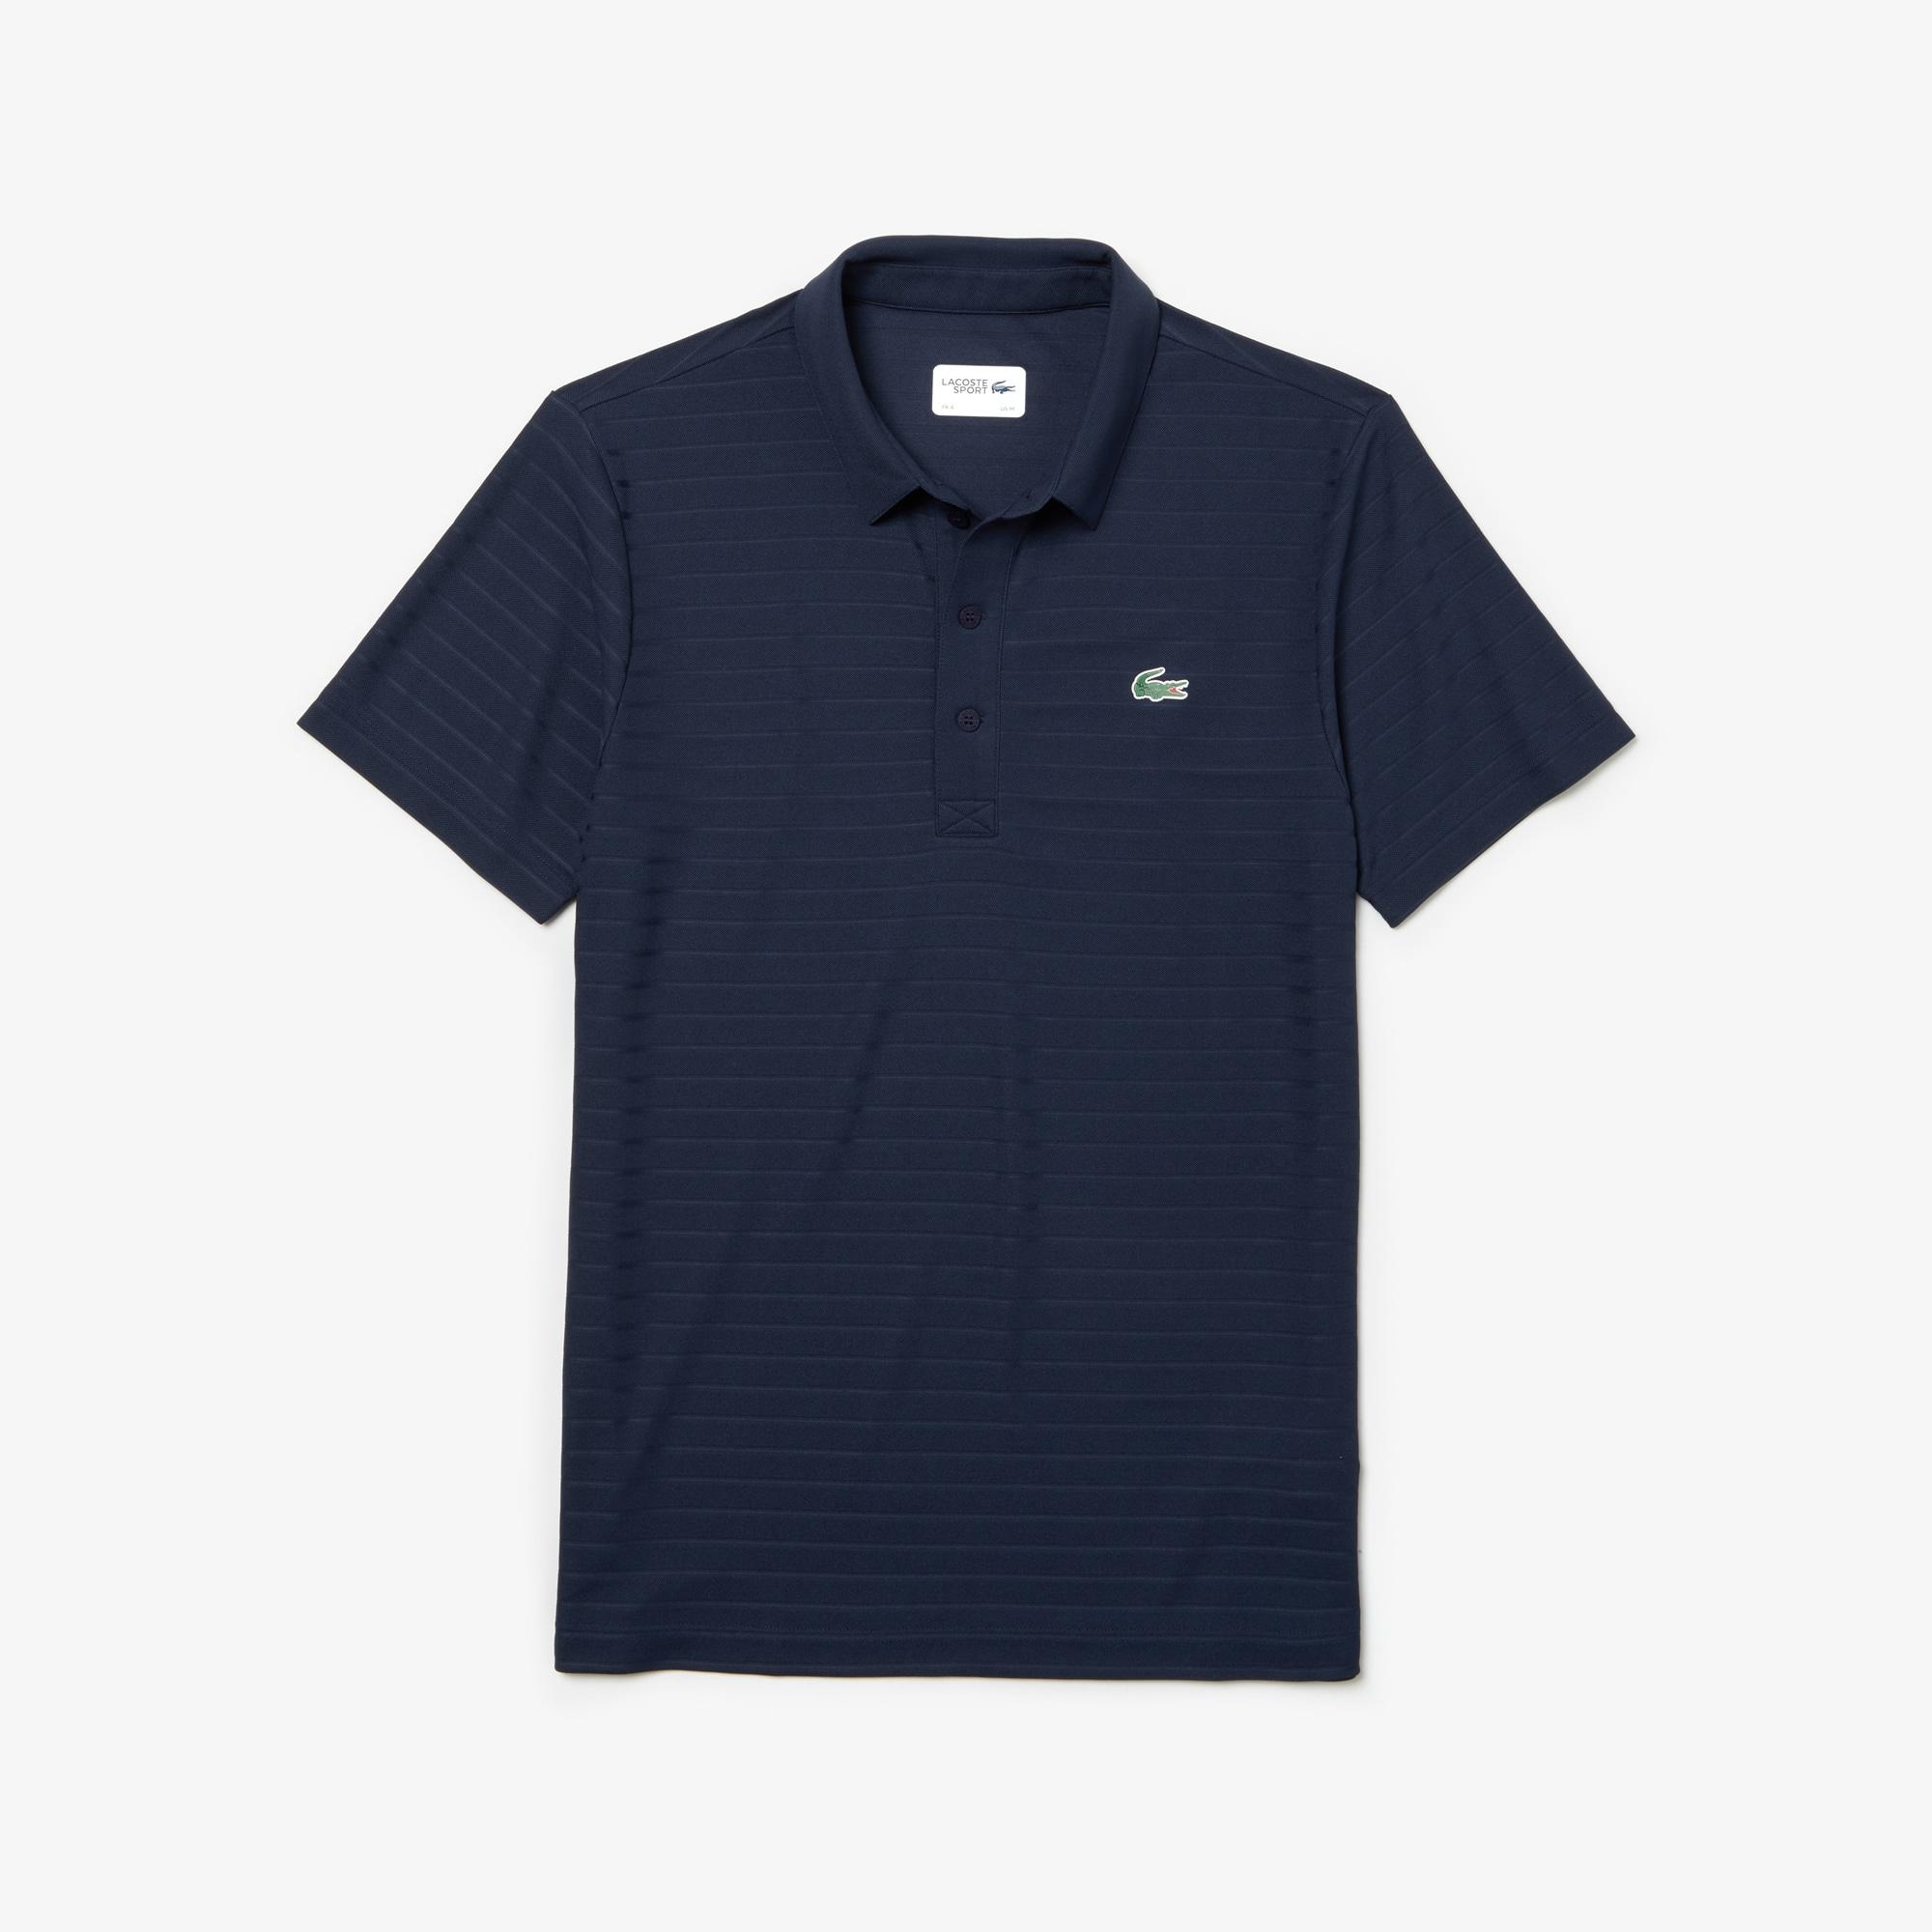 złapać kup dobrze Cena fabryczna Men's SPORT Golf Striped Tech Jacquard Jersey Polo Shirt